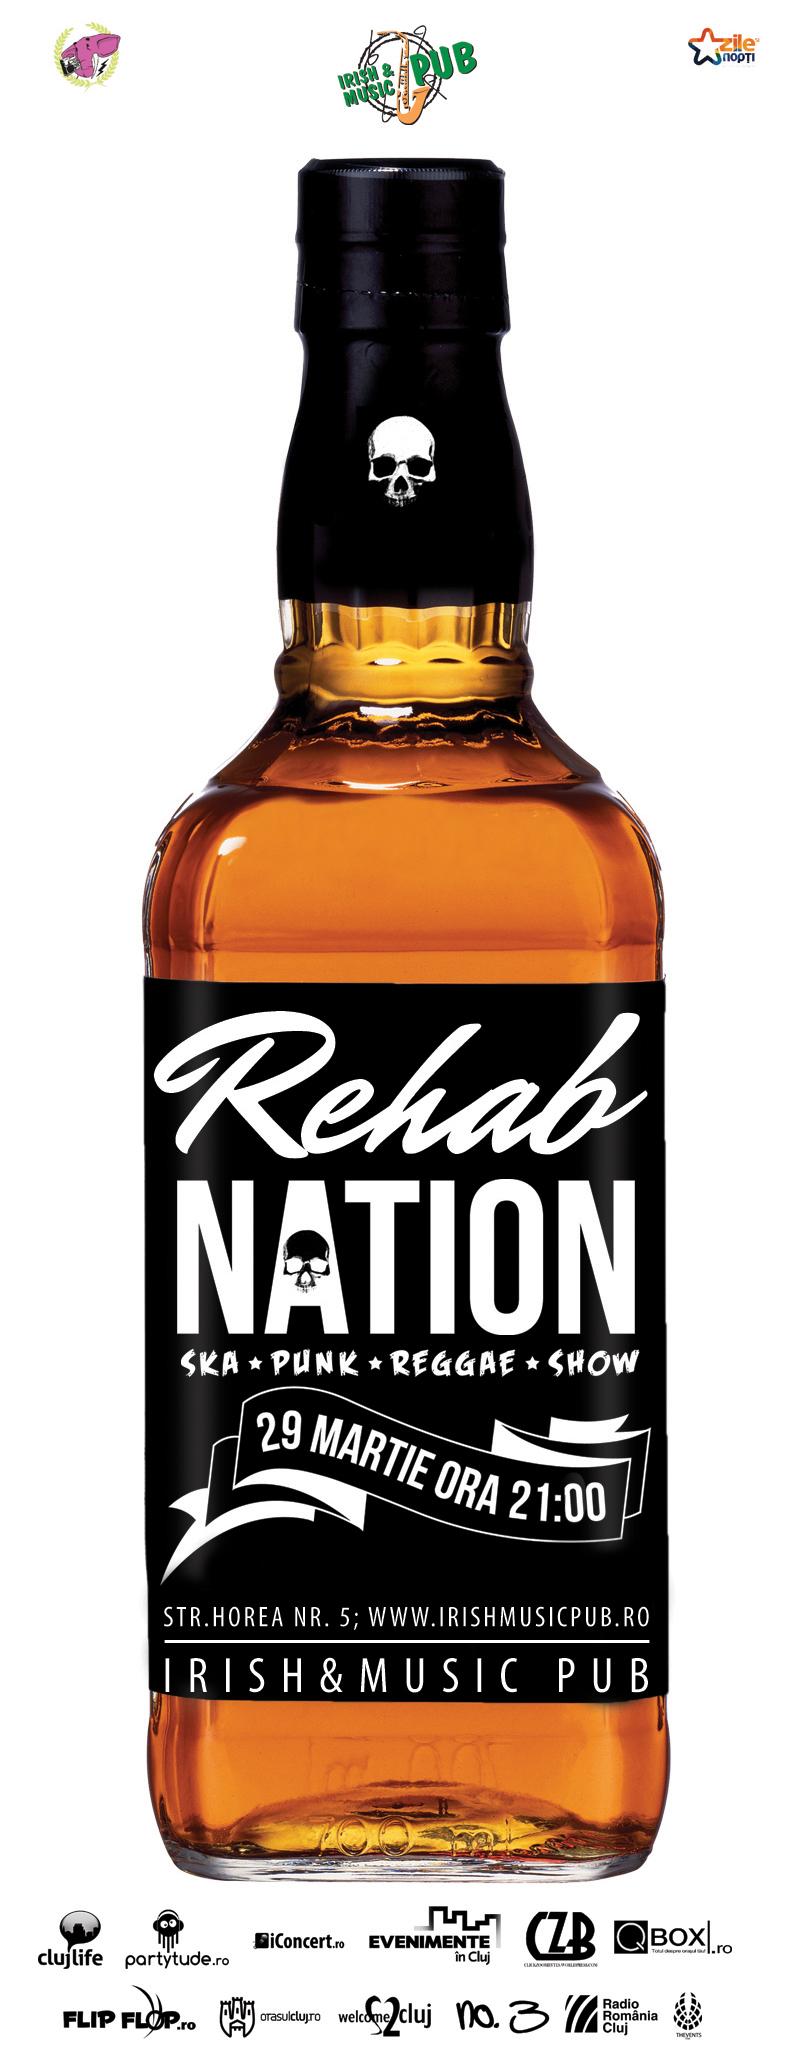 Rehab Nation @ Irish & Music Pub